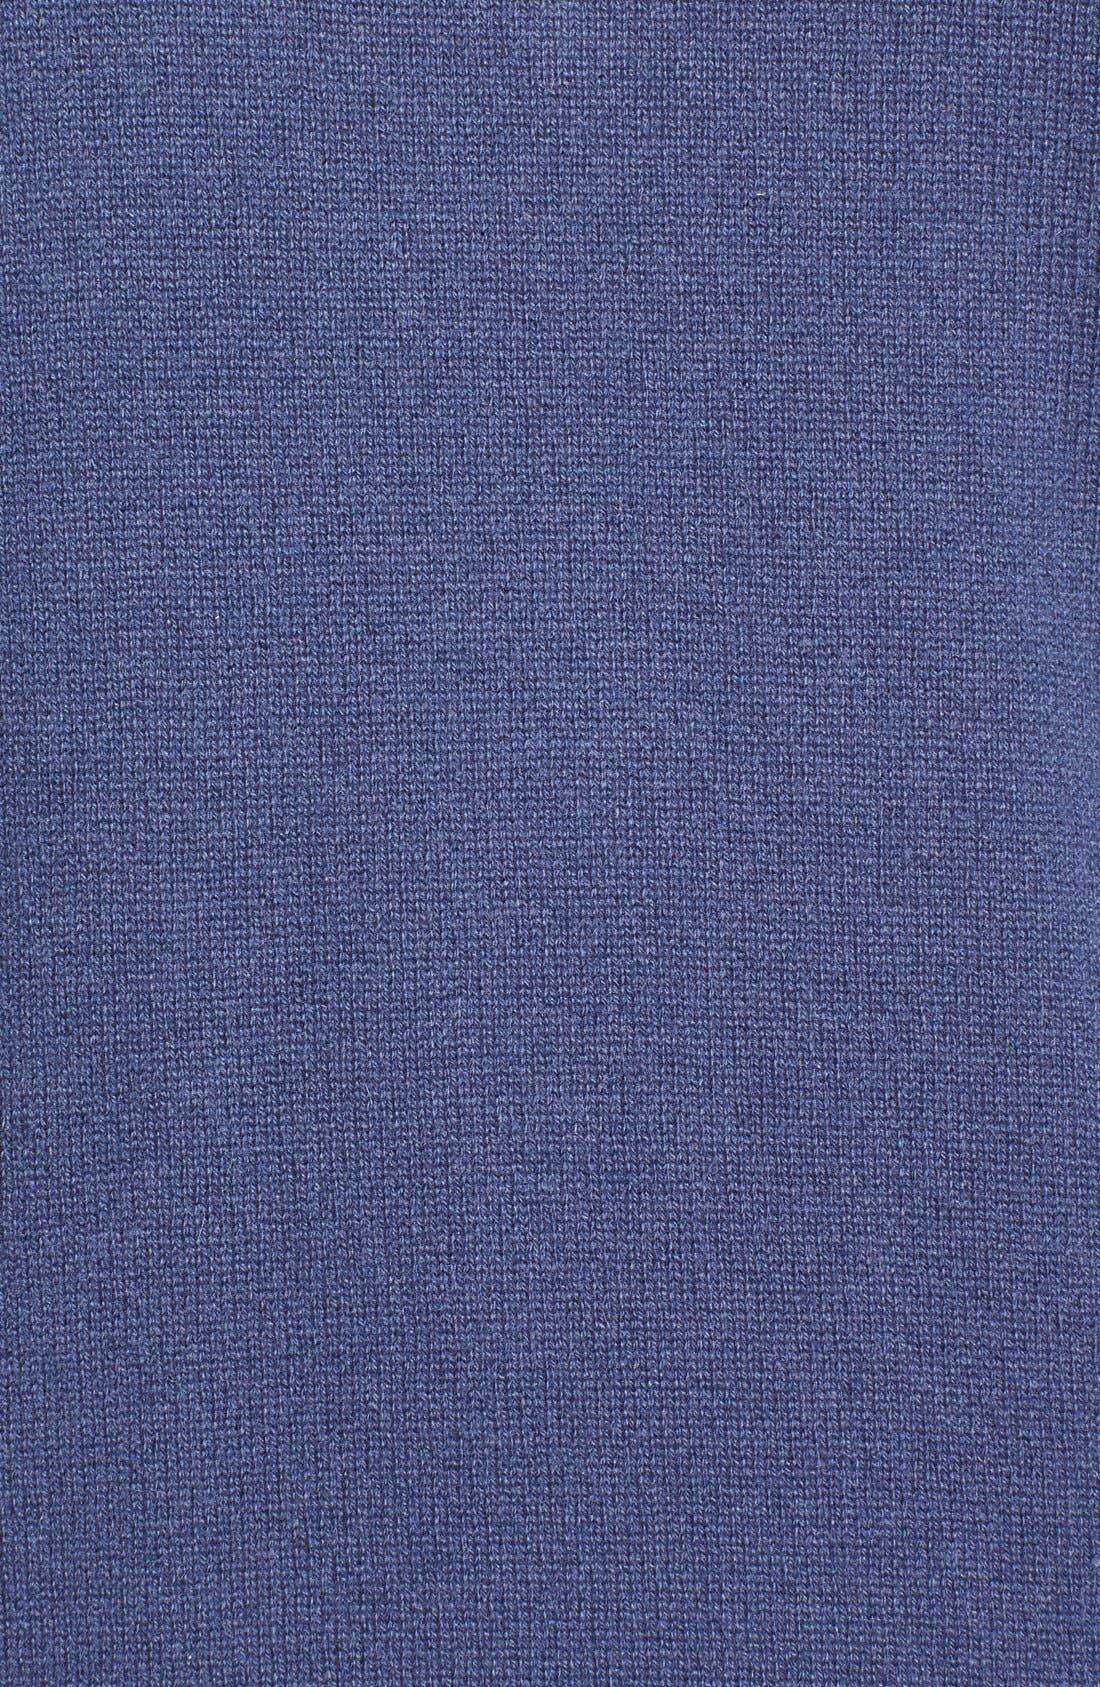 Alternate Image 3  - Equipment 'Cecile' Cashmere Sweater